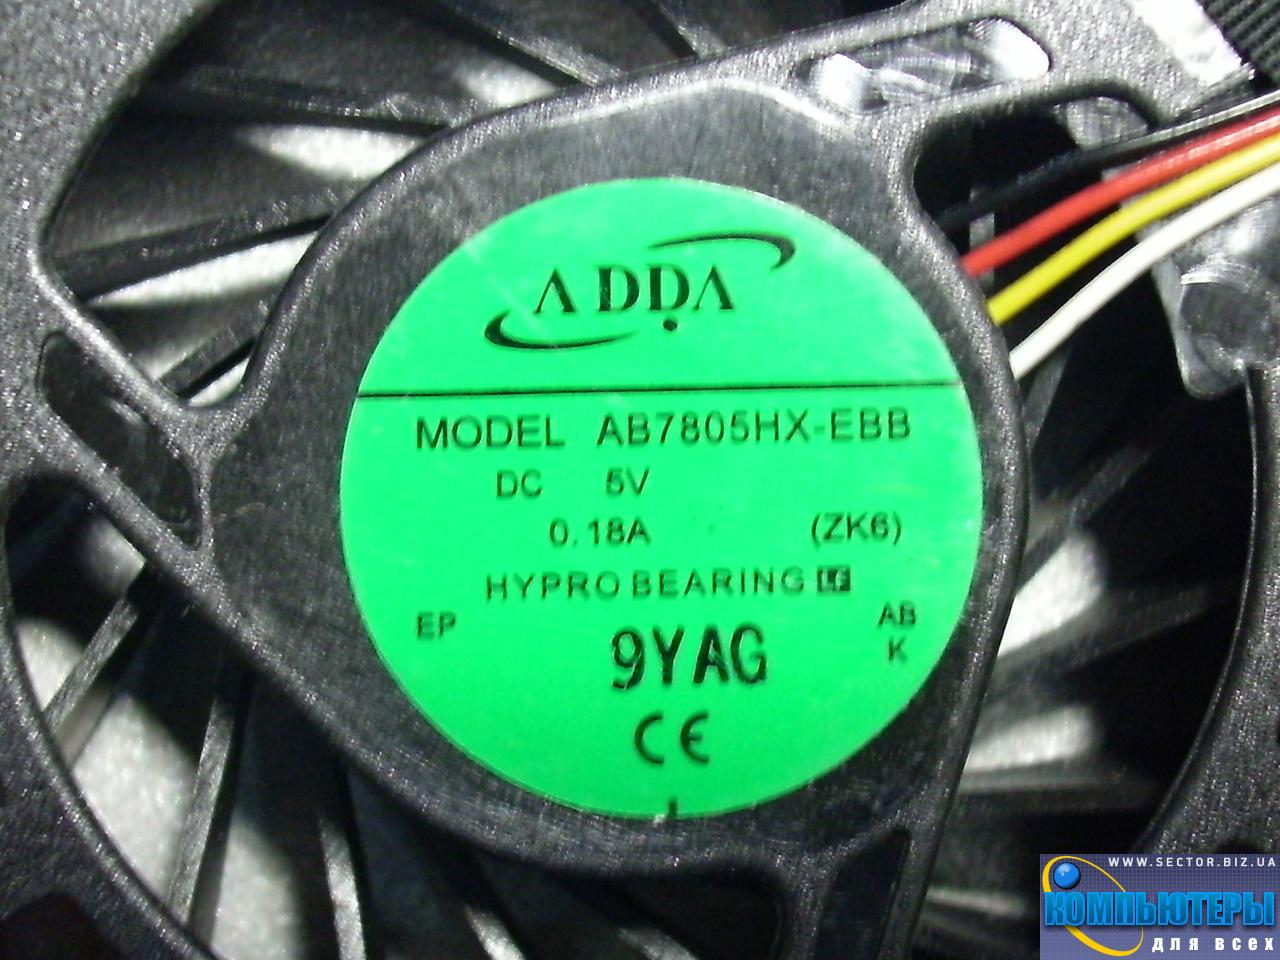 Кулер к ноутбуку Acer Aspire 5739 5739G p/n: AB7805HX-EBB (ZK6). Фото № 3.